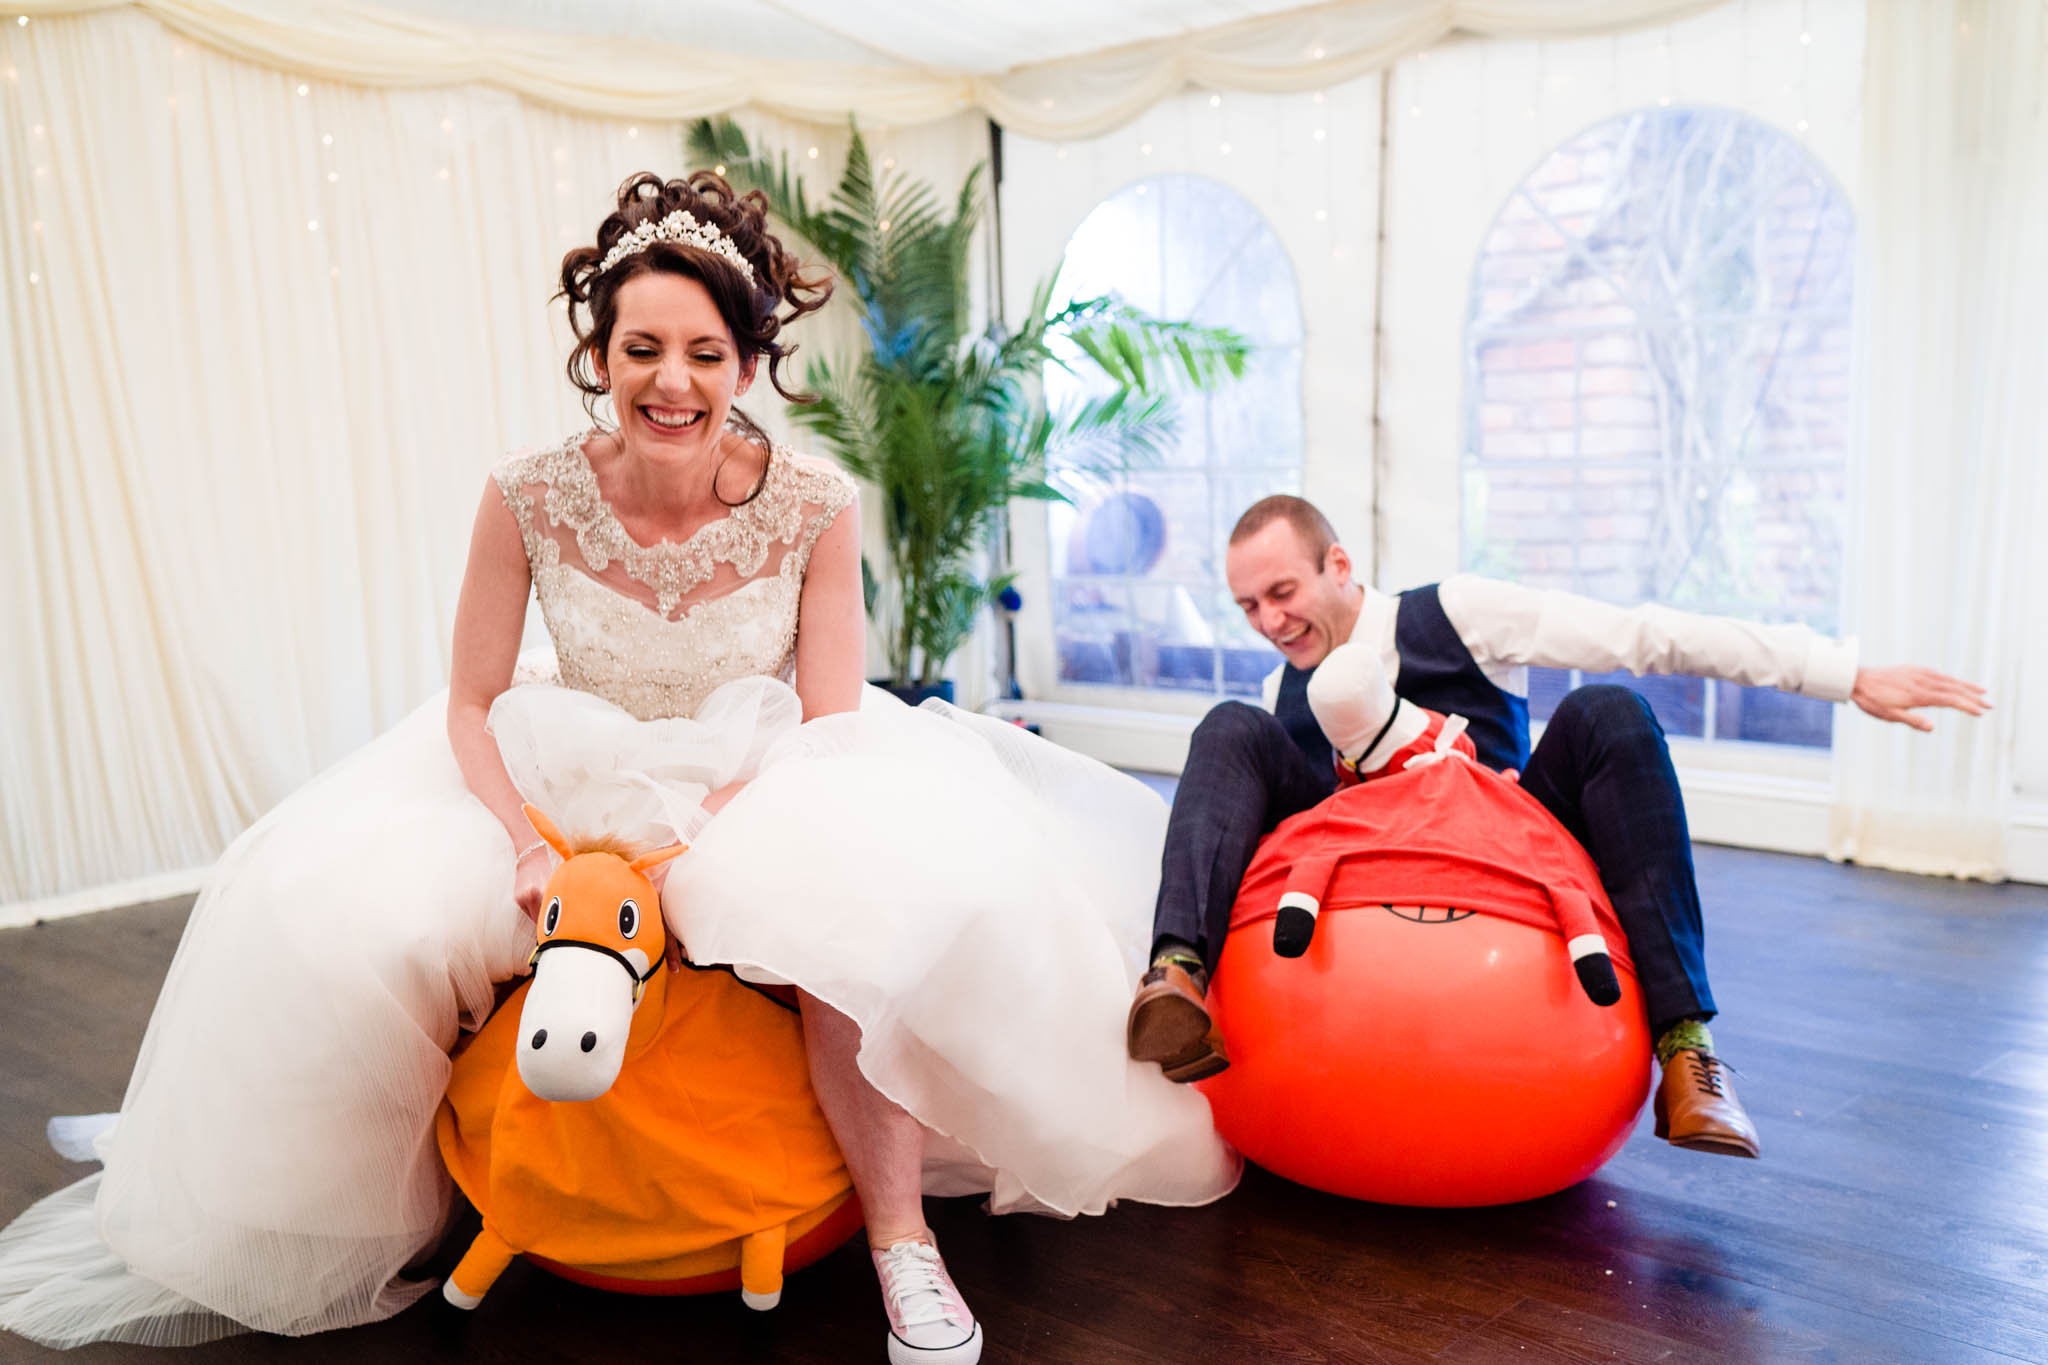 wedding space hoppers - fun wedding photography - candid wedding photography